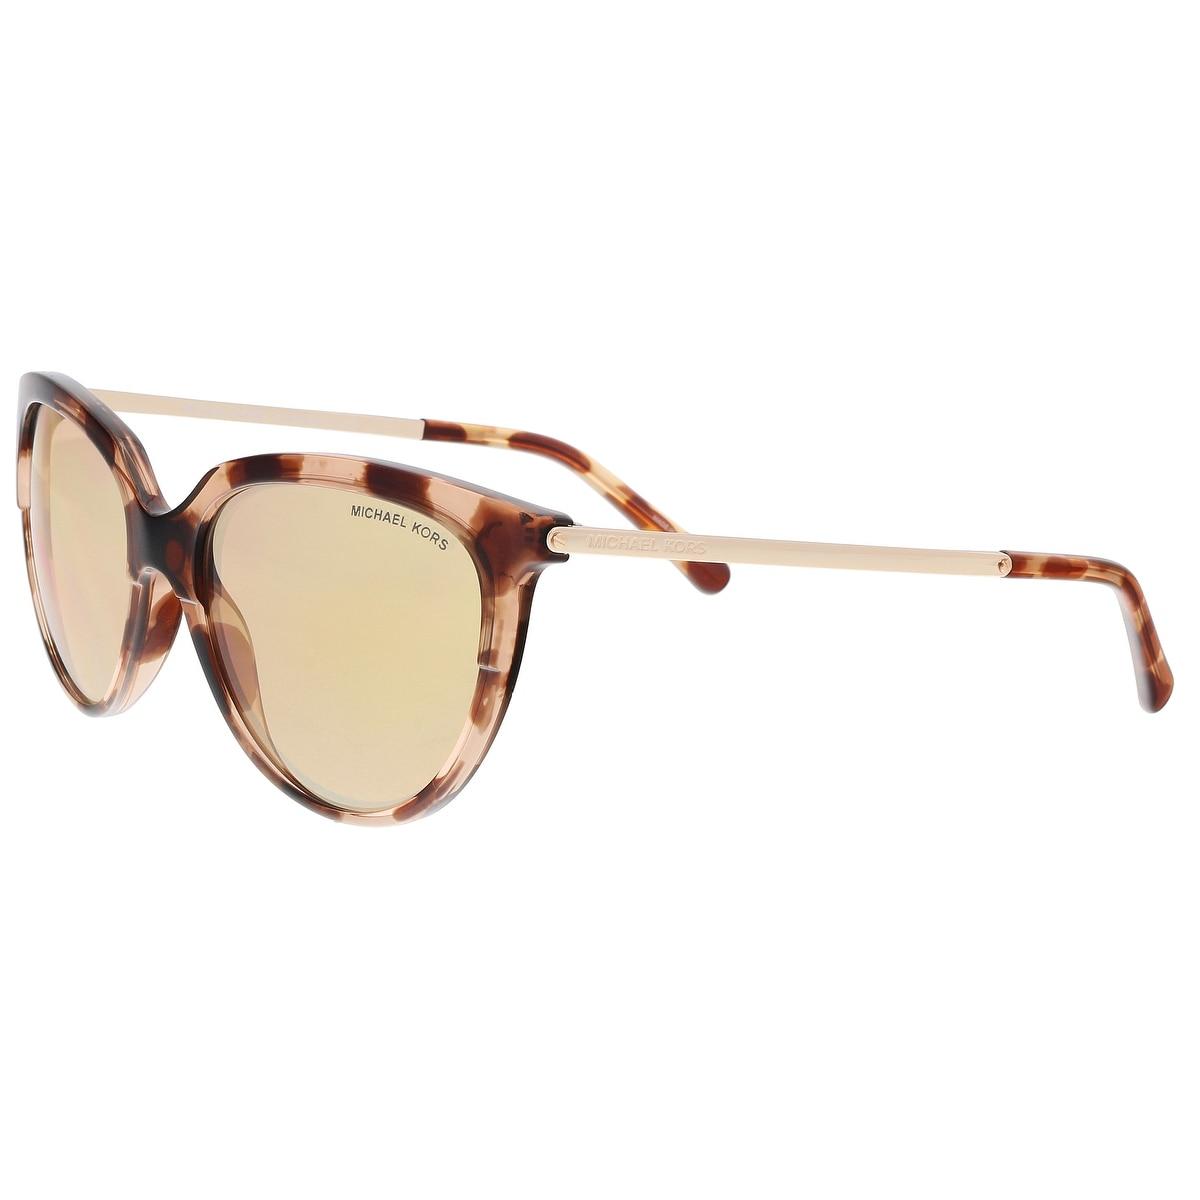 5fef680668 Plastic Michael Kors Sunglasses